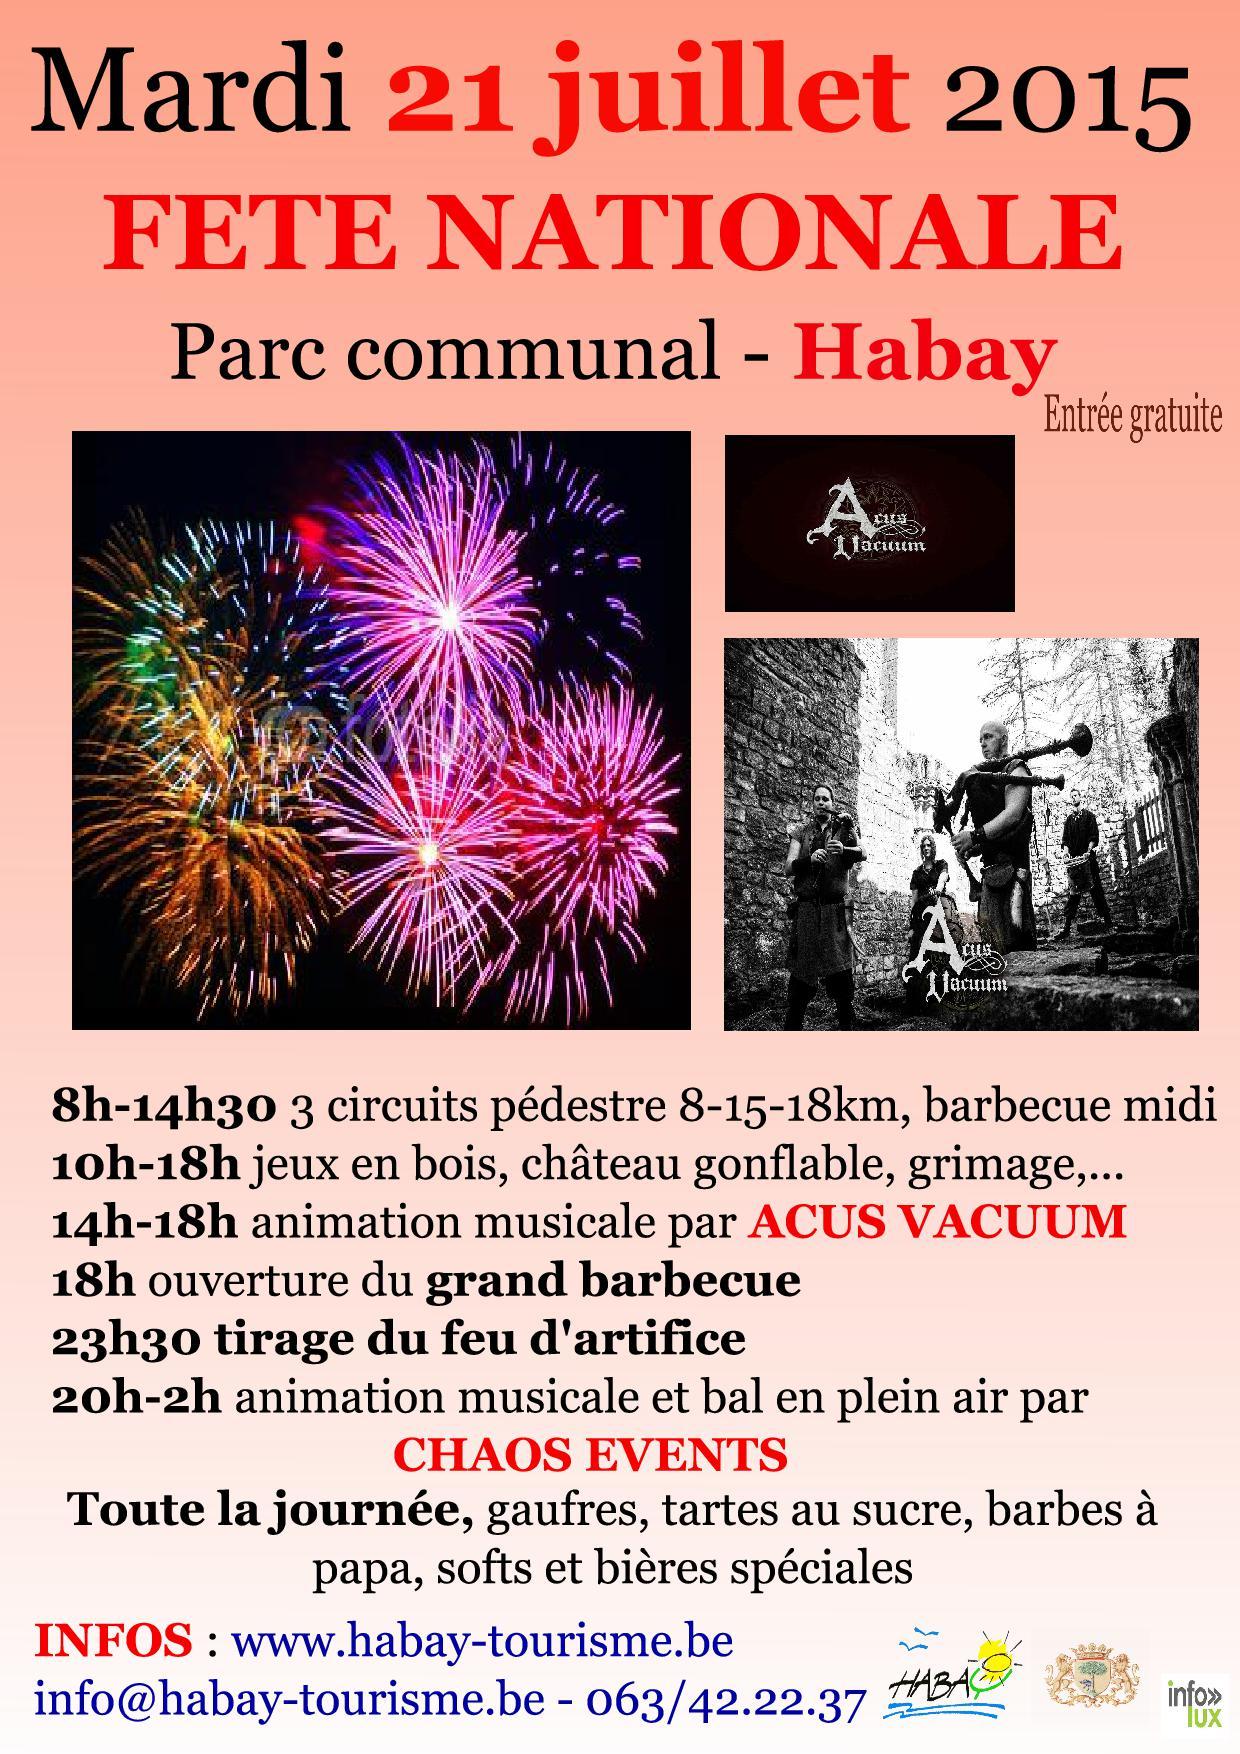 21 juillet Habay